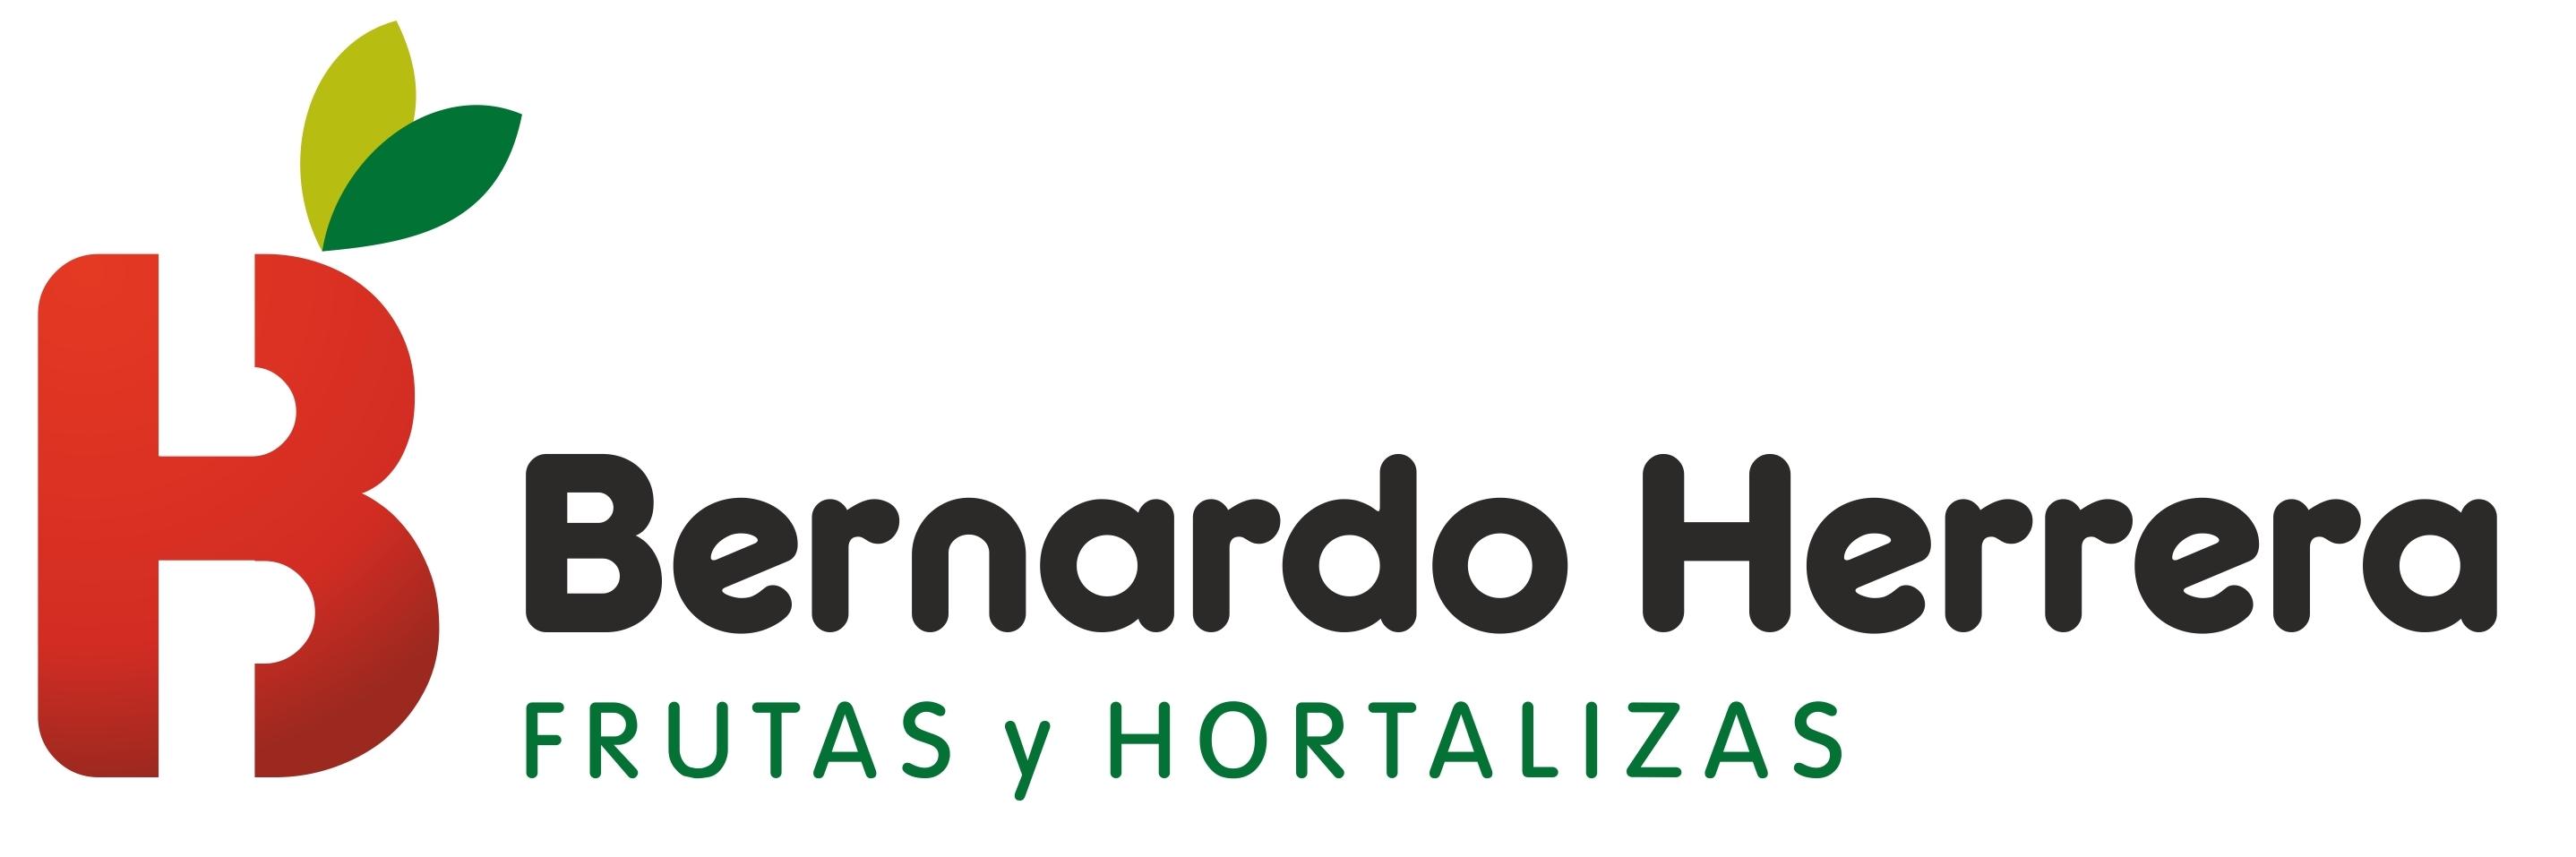 BERNARDO HERRERA